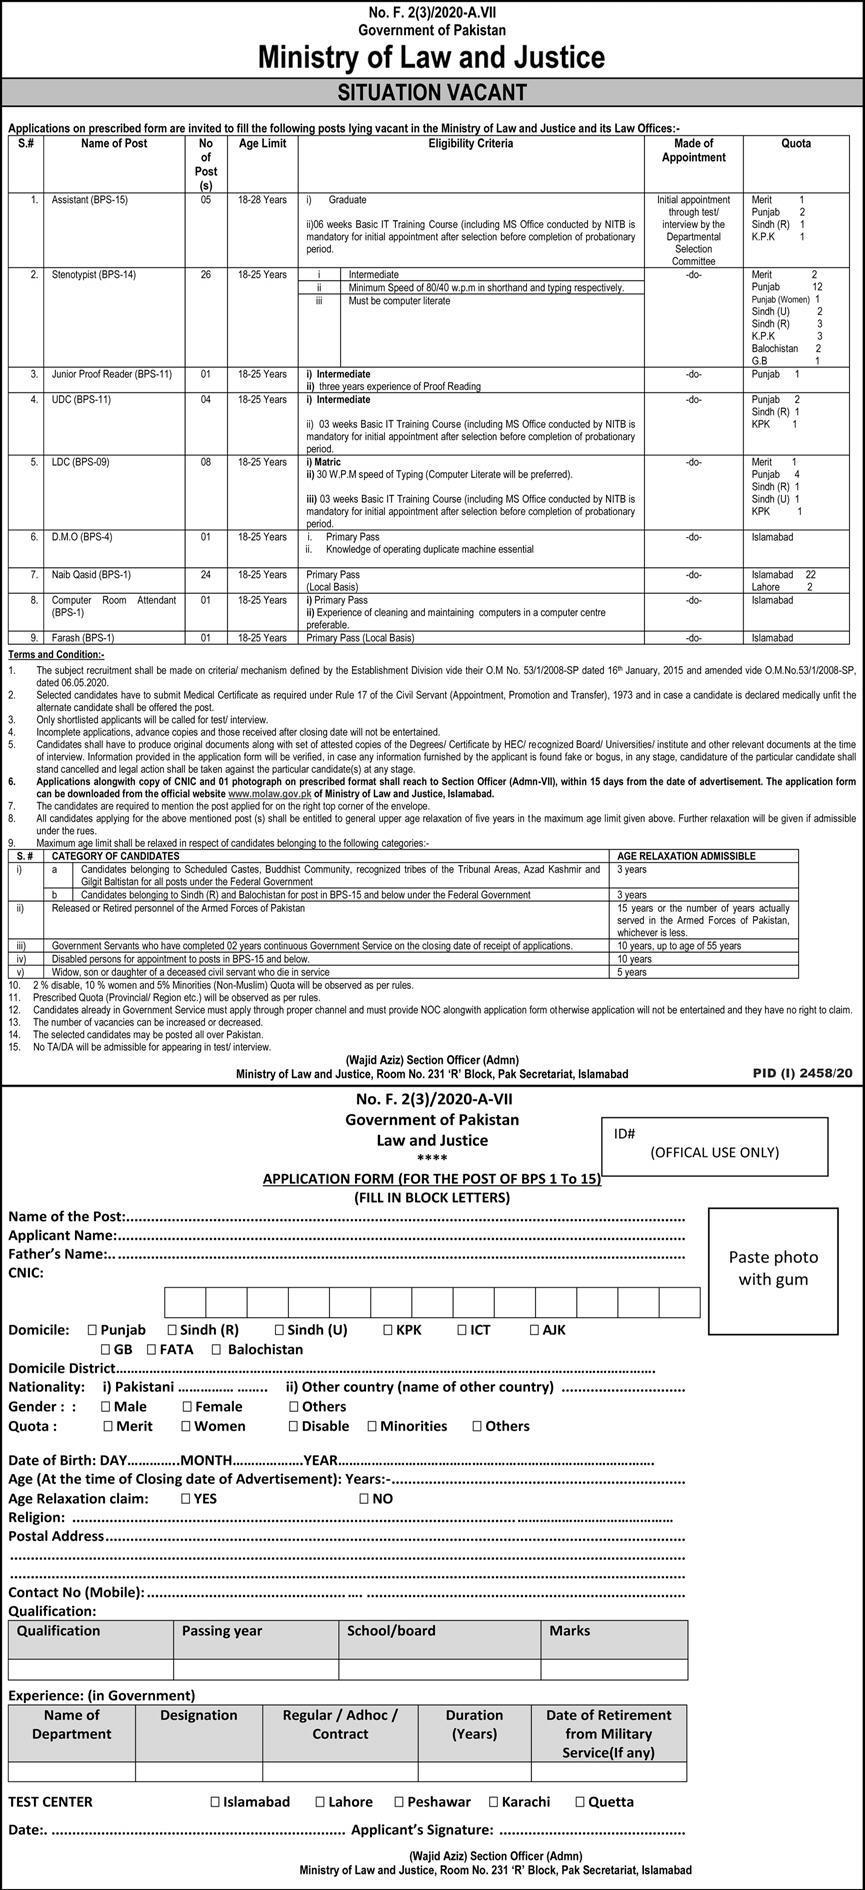 Ministry of Law & Justice Pakistan Jobs in Pakistan - Download Job Application Form Jobs 2021